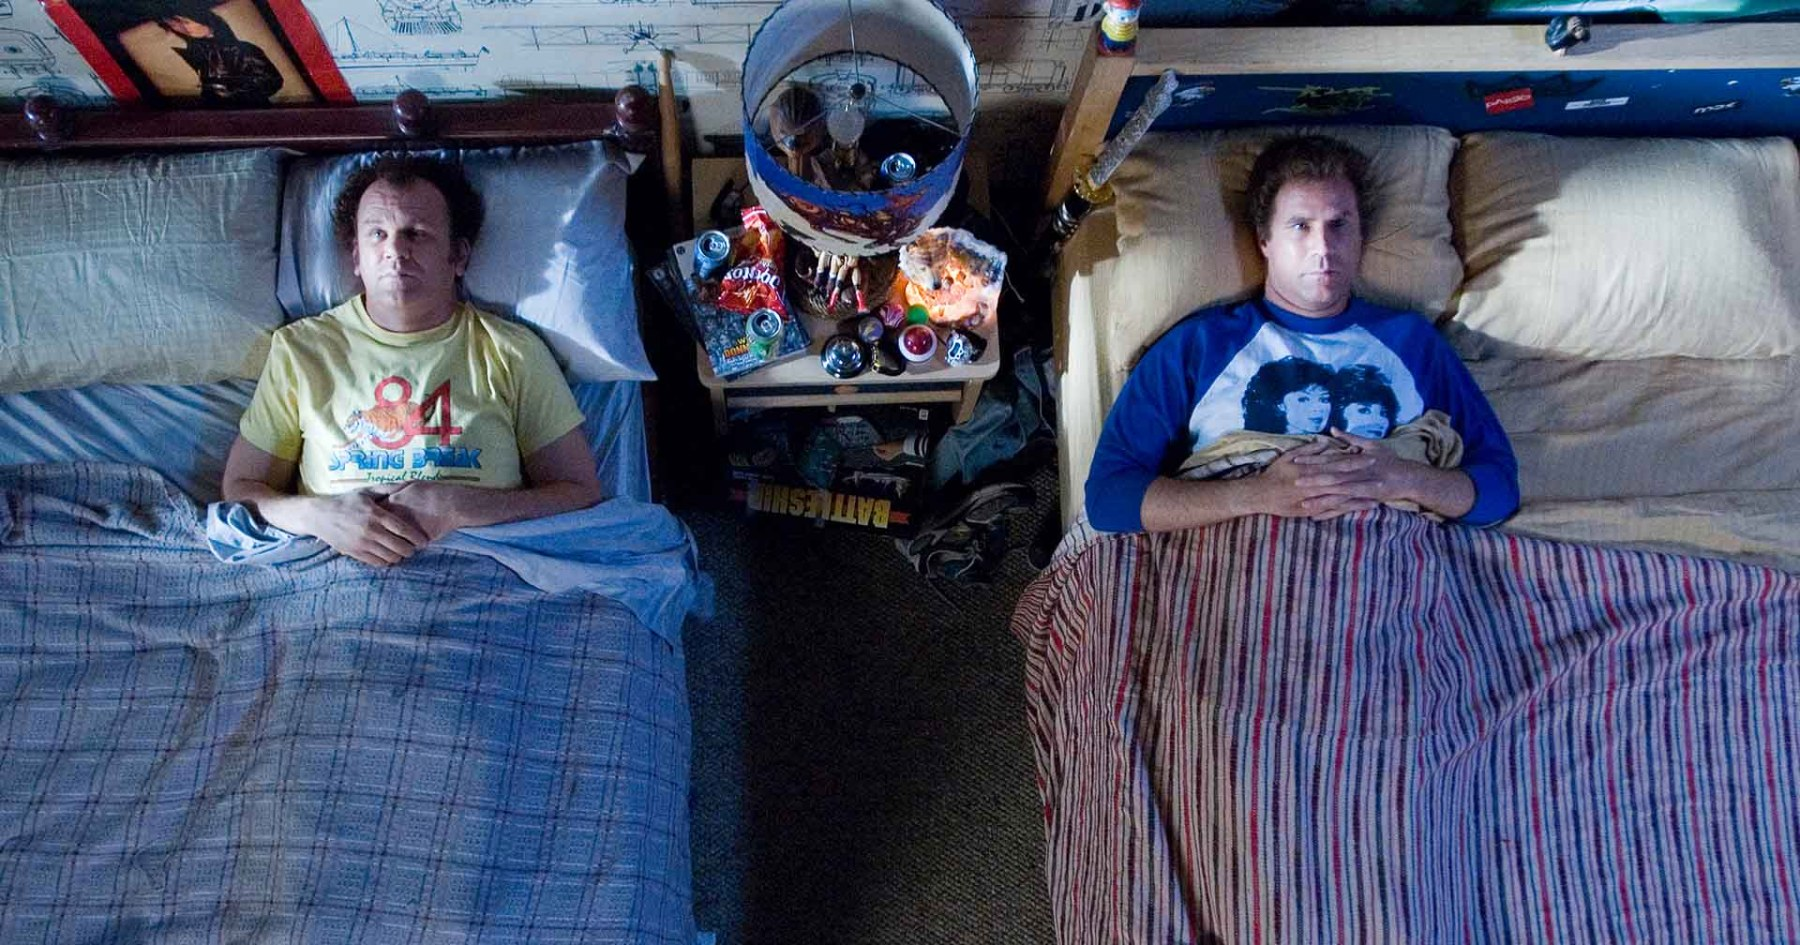 Dale Doback (John C. Reilly) and Brennan Huff (Will Ferrel)